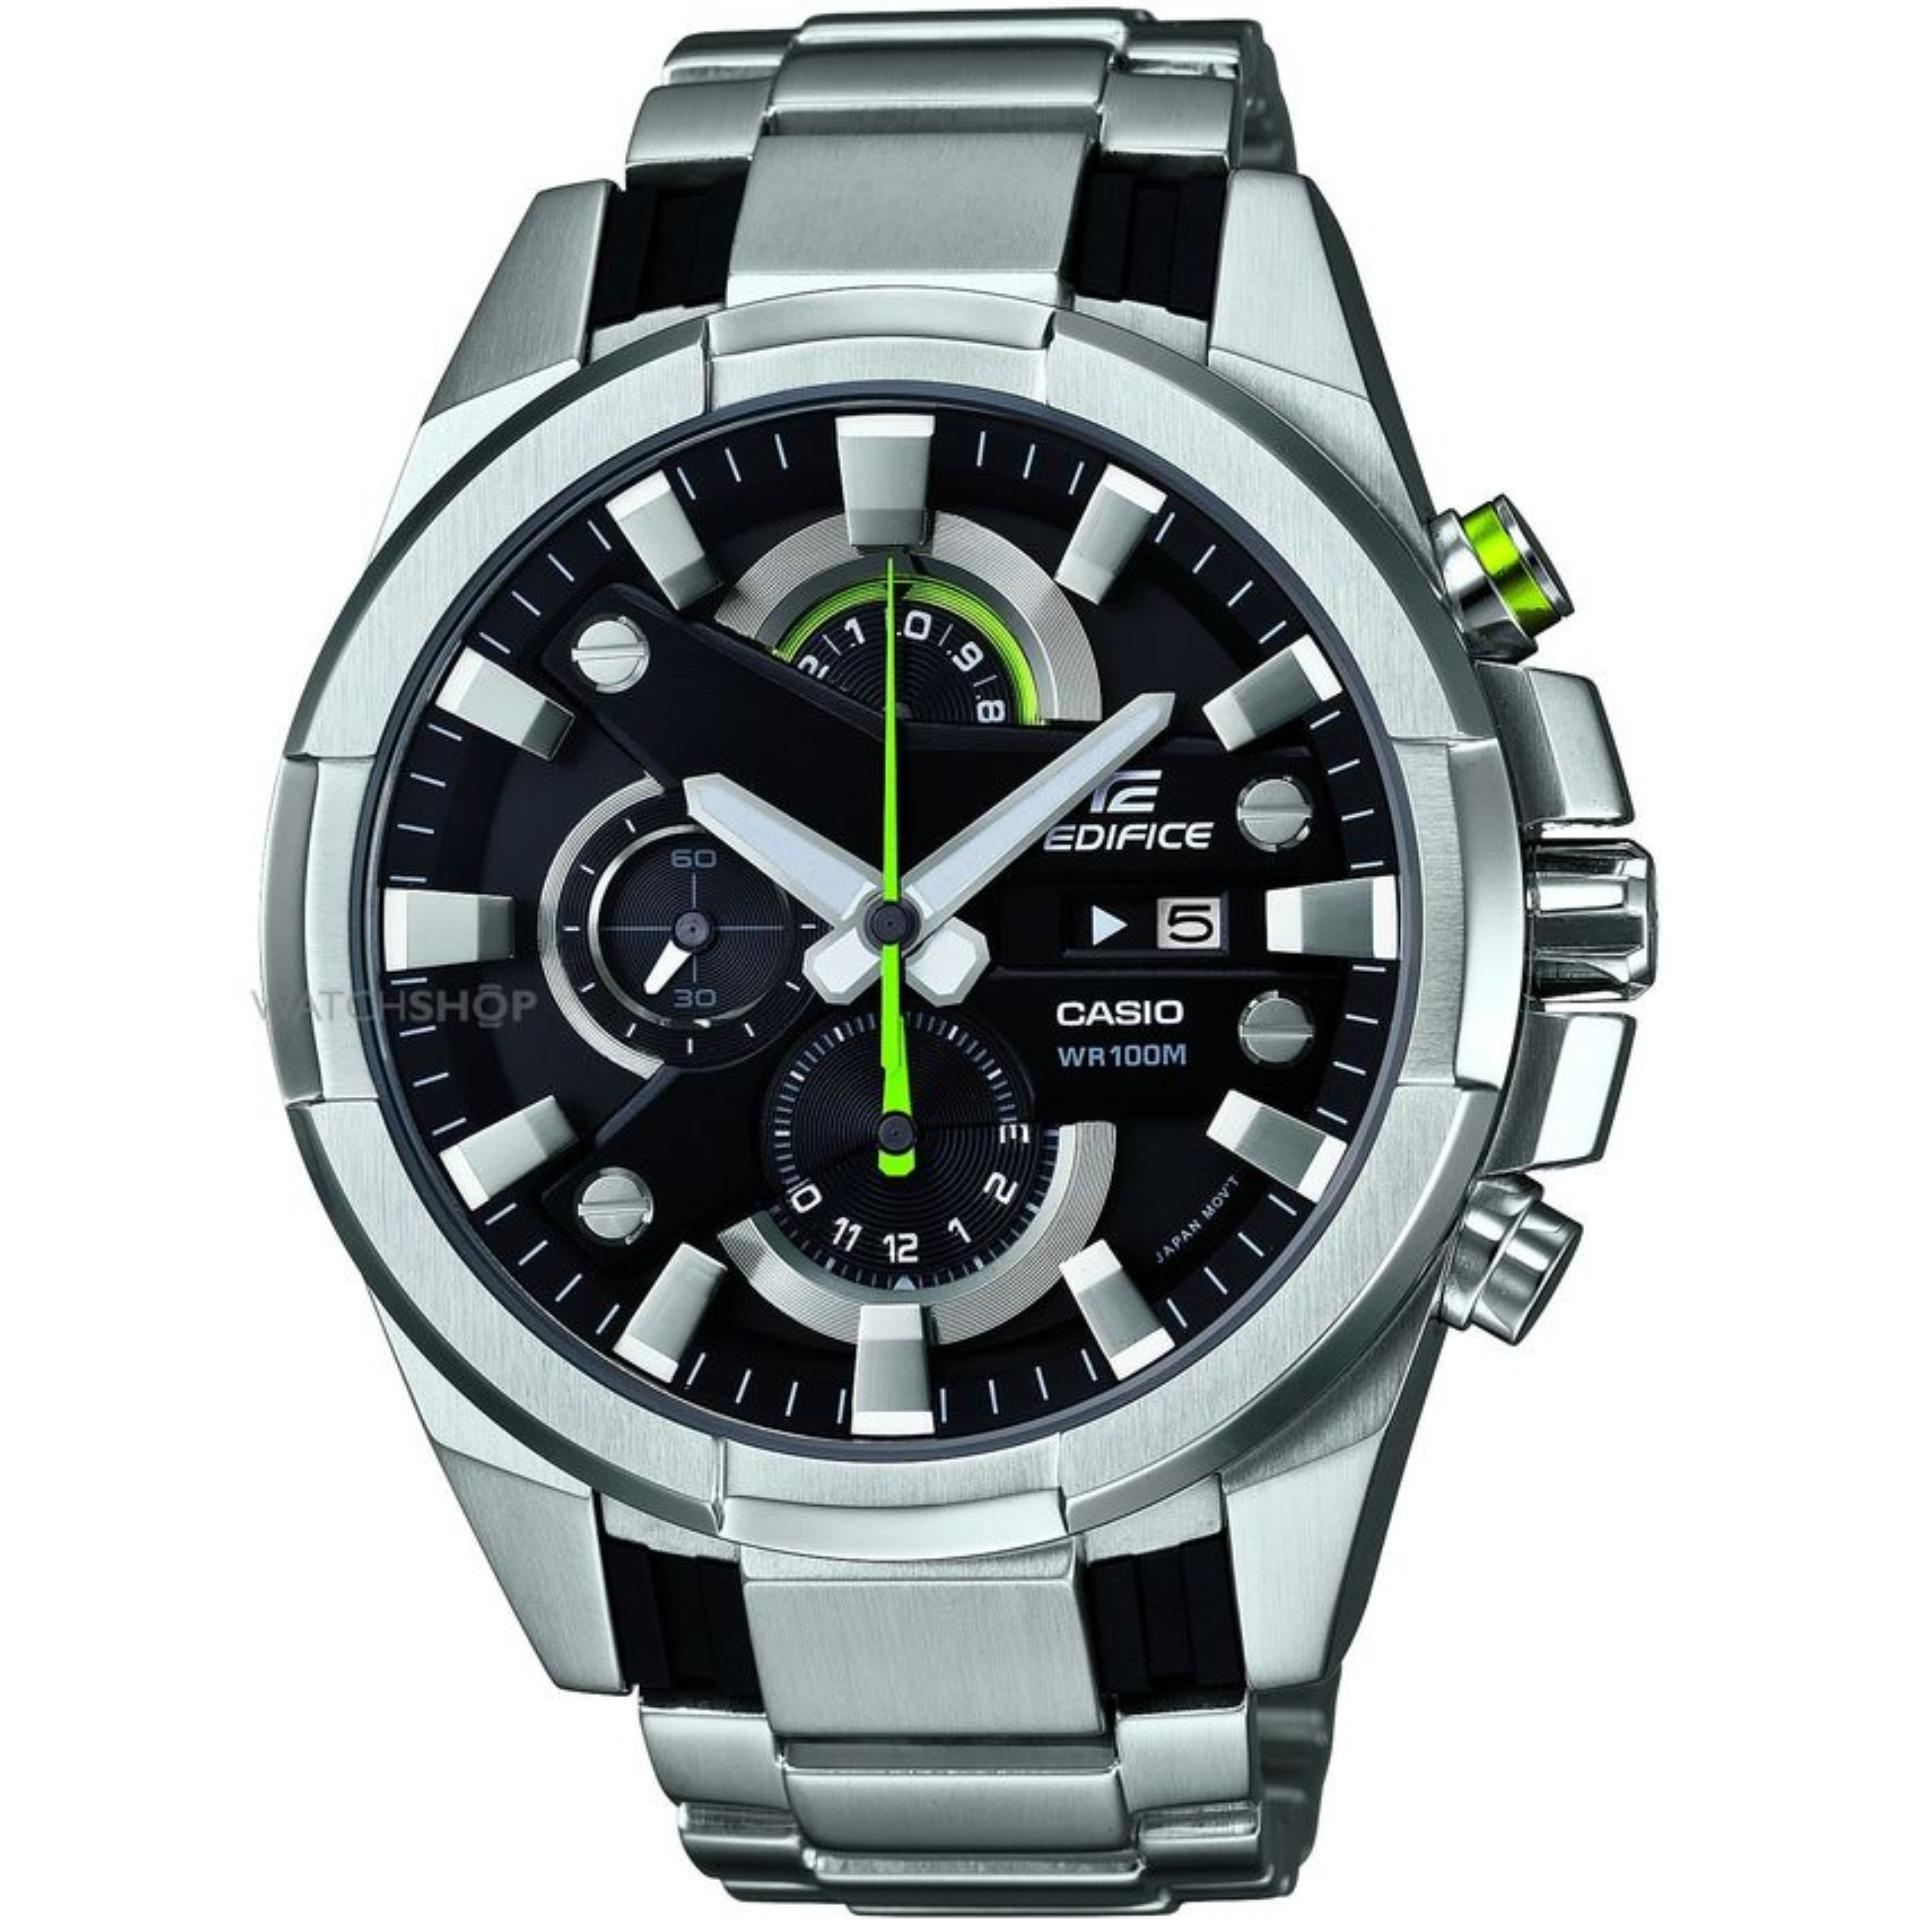 Jam Tangan Formal Pria - Casio Edifice EFR-540D-1AVUDF Silver ... 1a711f23c5